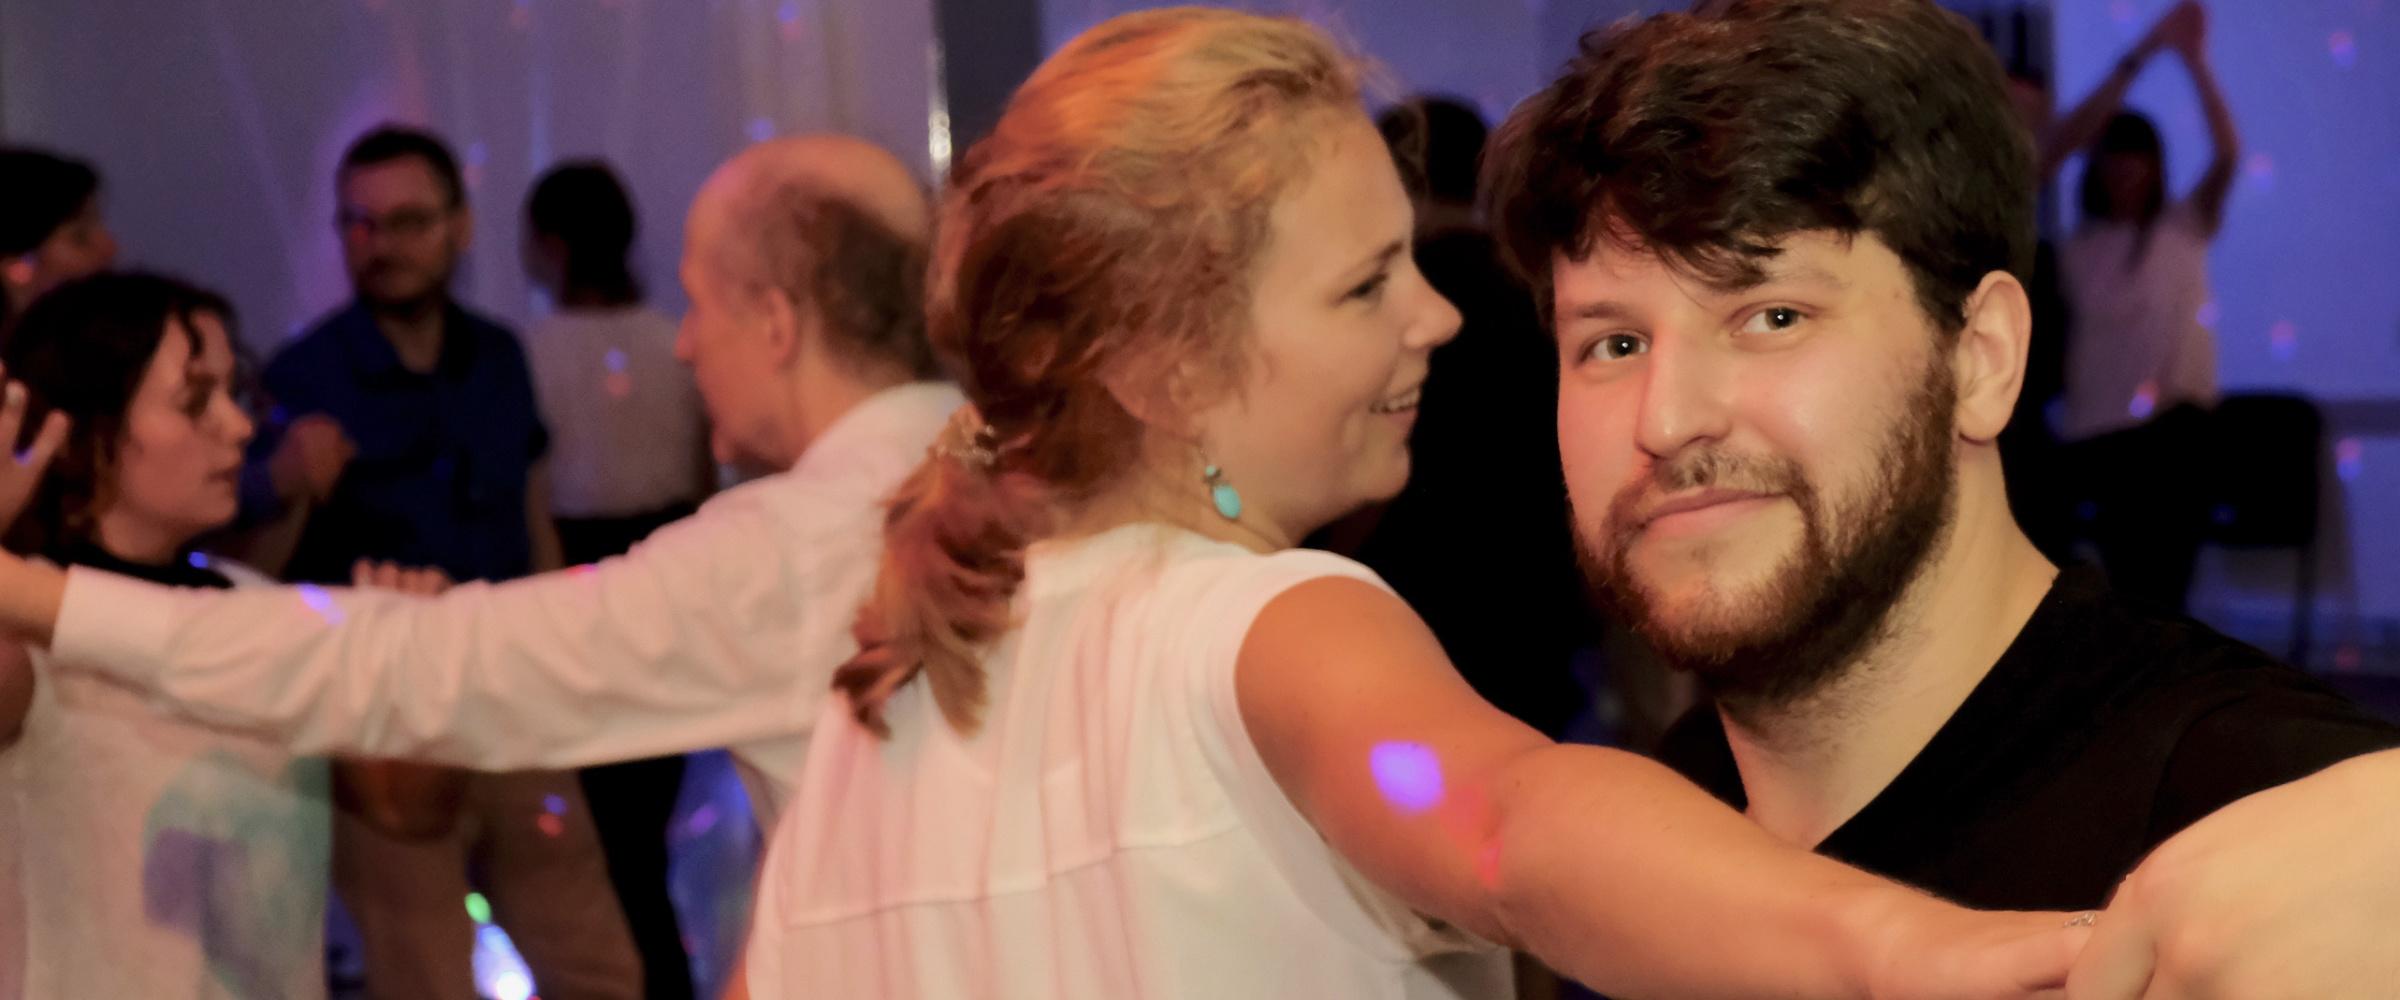 Modern Jive offene Tanzkurse Di & Do- jederzeit anfangen - auch ohne Tanzpartner